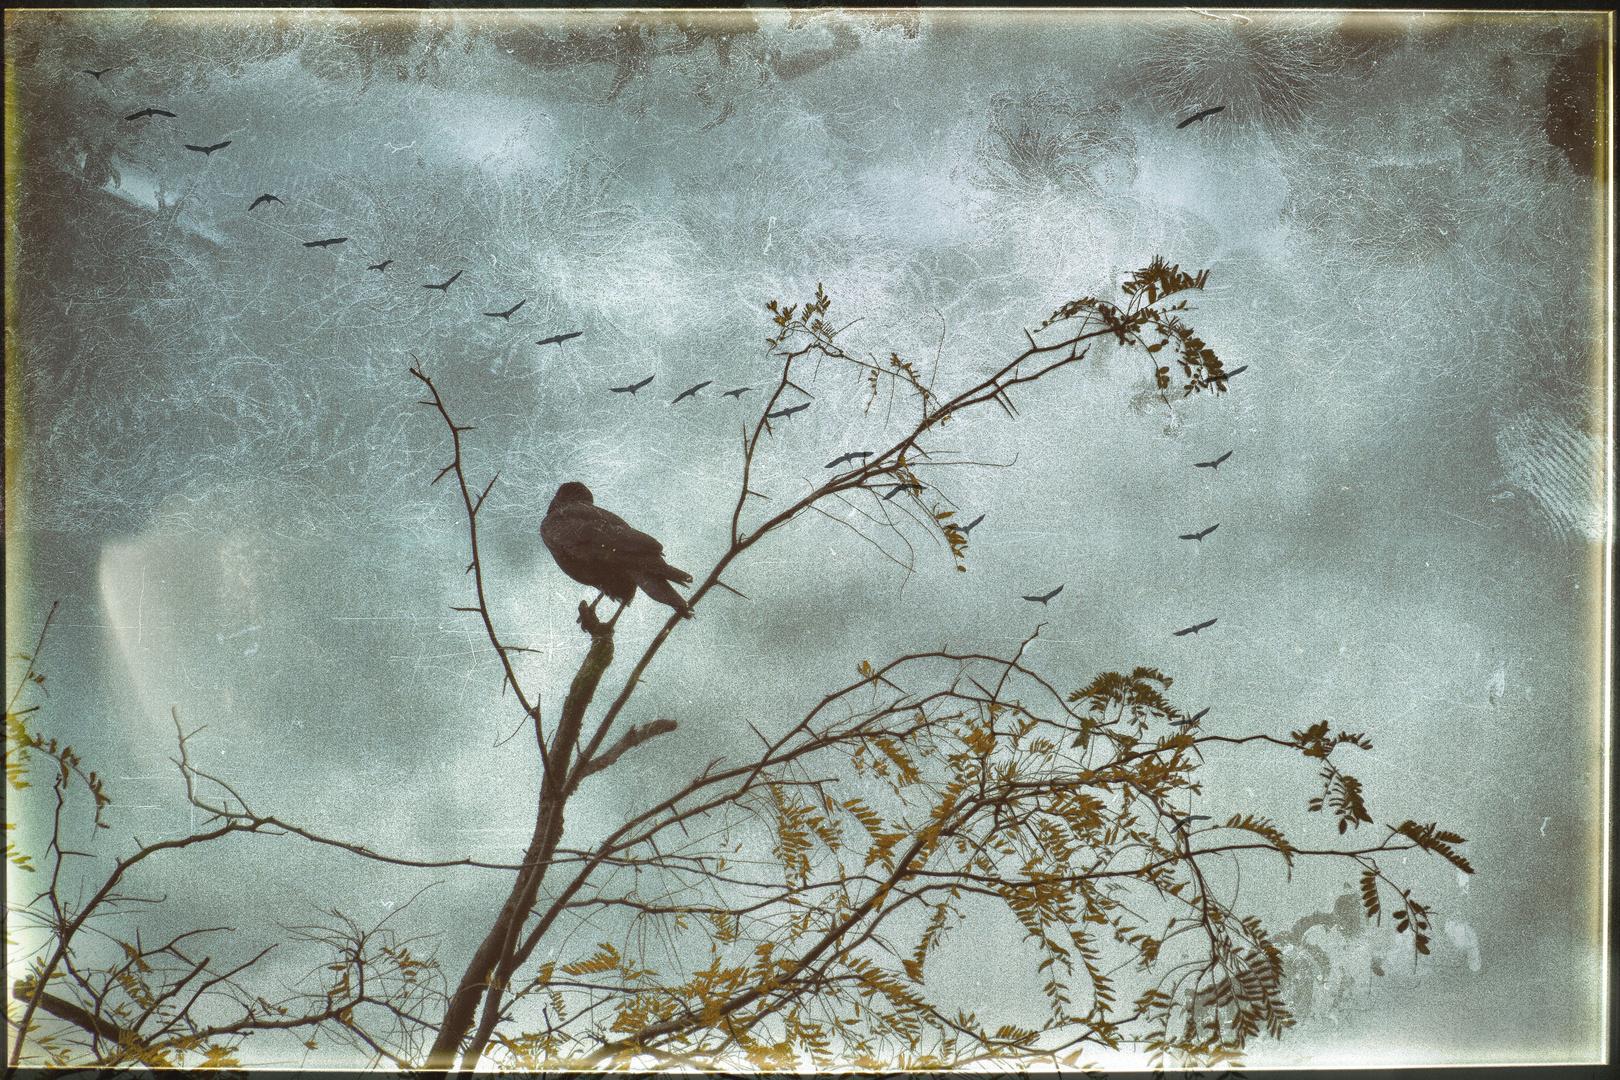 Vogel-Baum